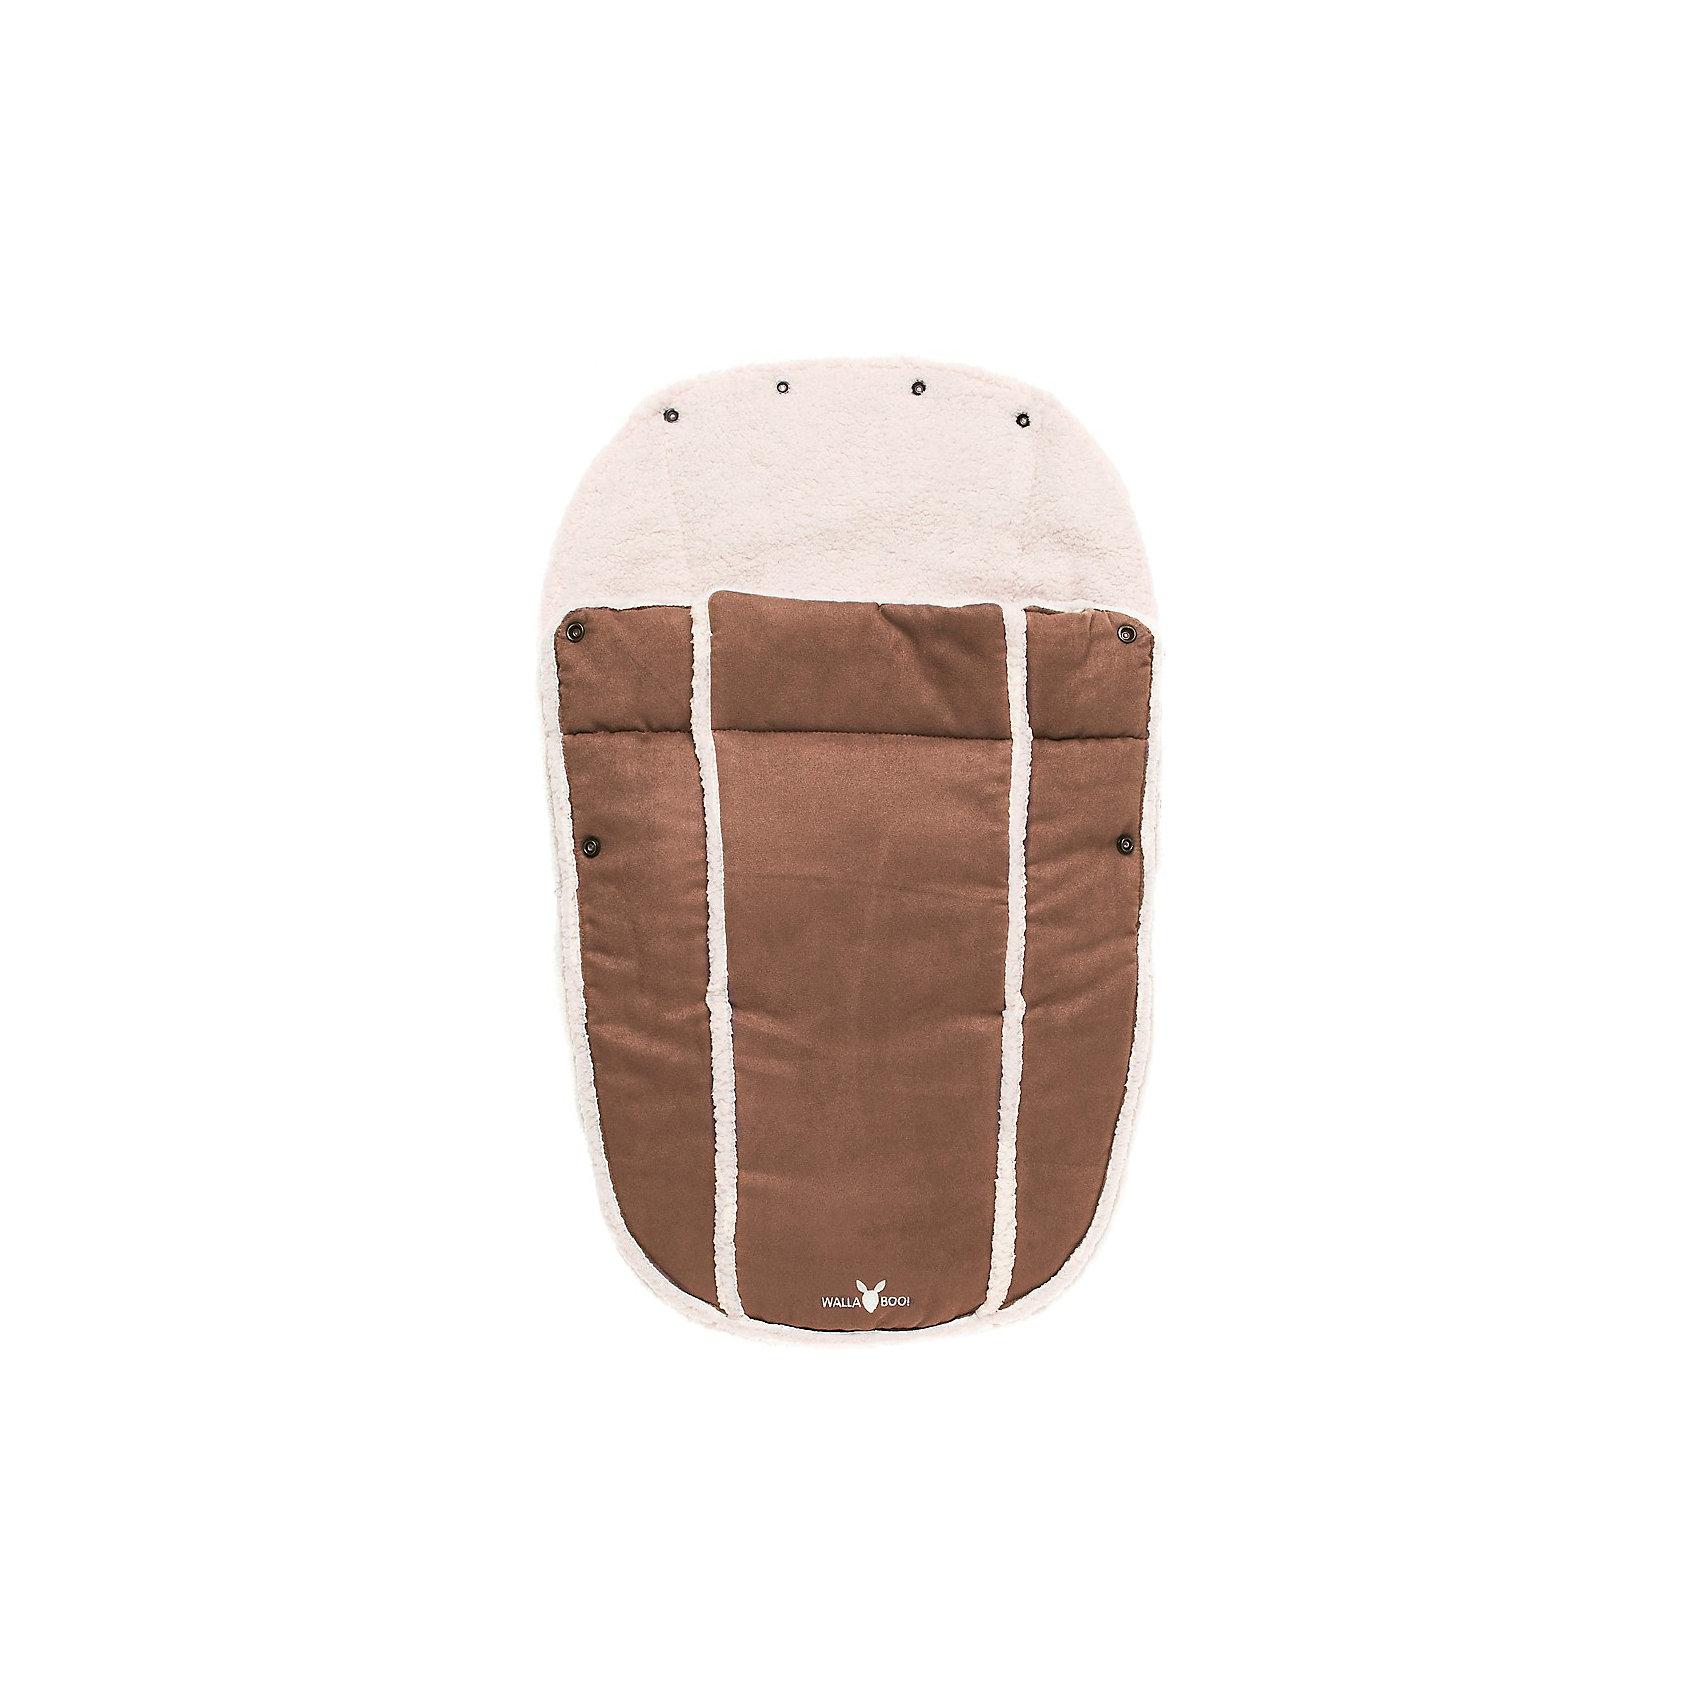 Конверт в коляску 0-12 месяцев, Wallaboo, шоколад